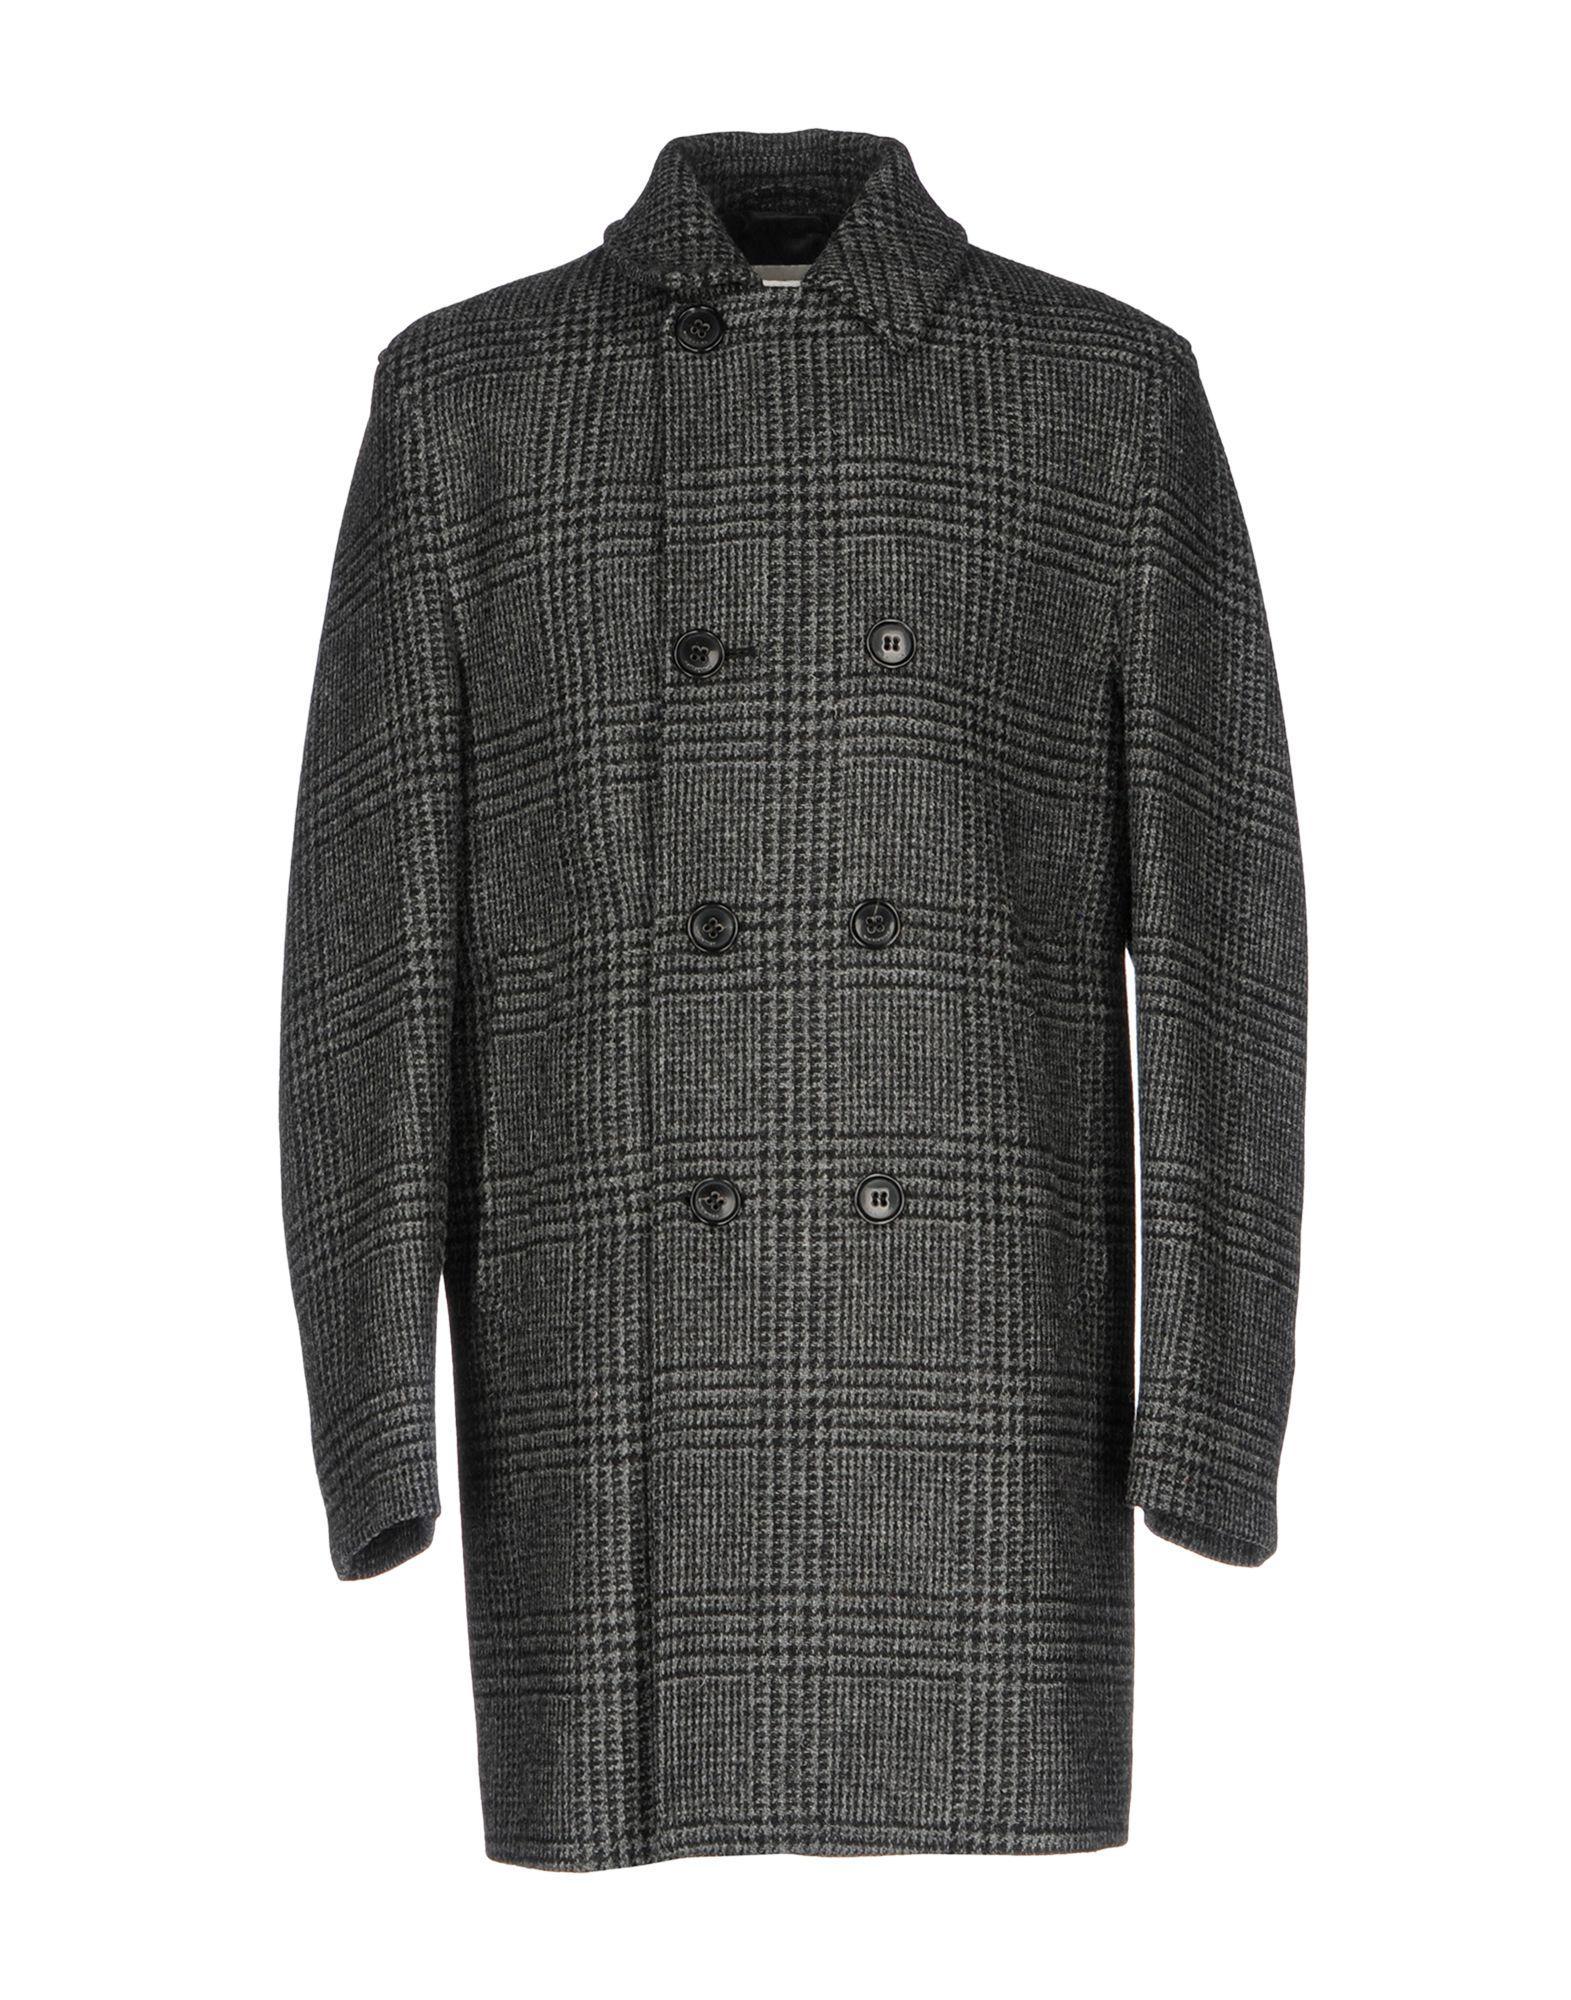 Mackintosh Coats In Lead